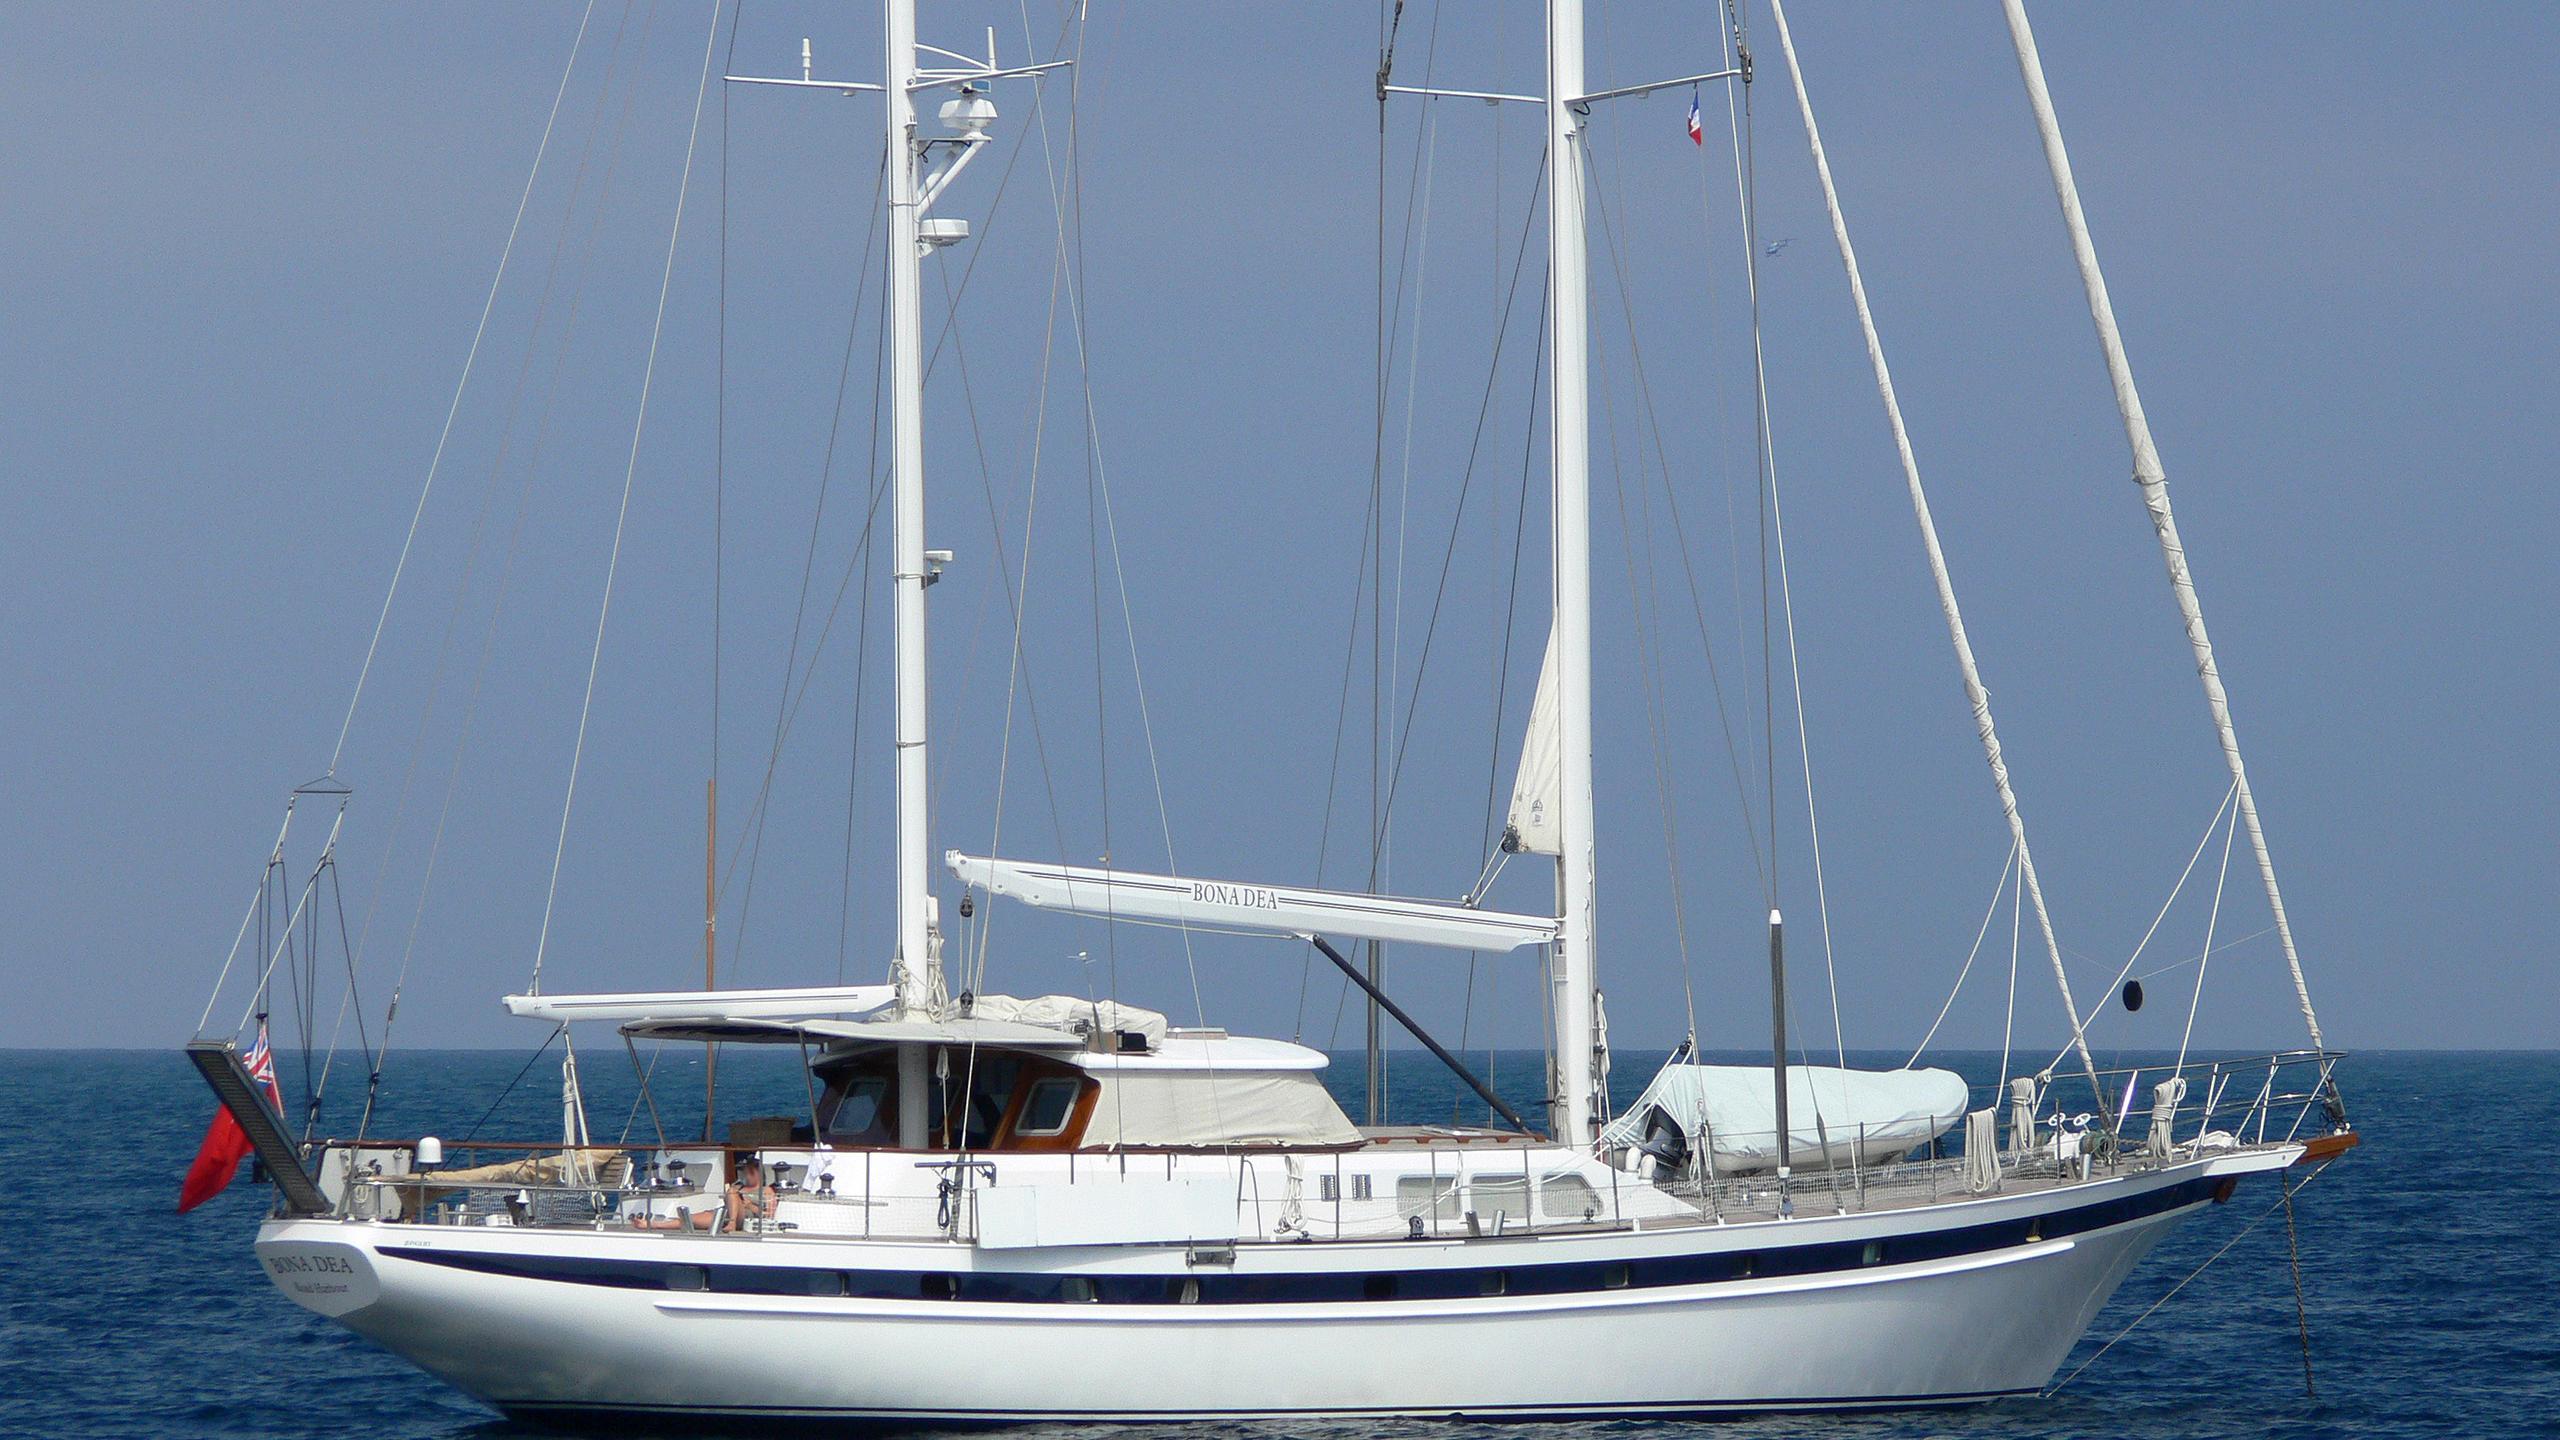 bona-dea-yacht-exterior